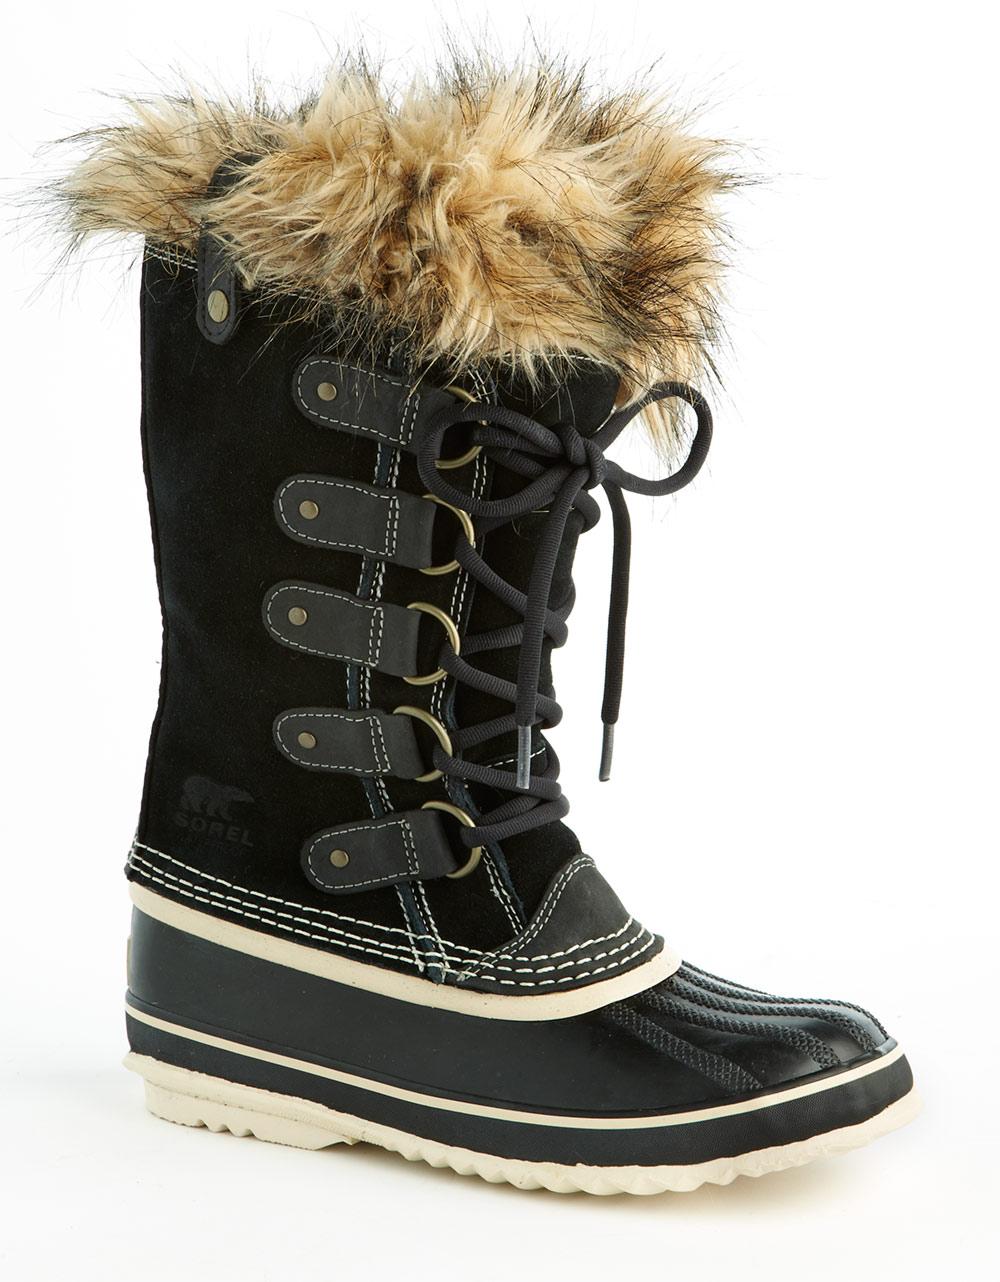 sorel joan of arctic boots in black blk lyst. Black Bedroom Furniture Sets. Home Design Ideas